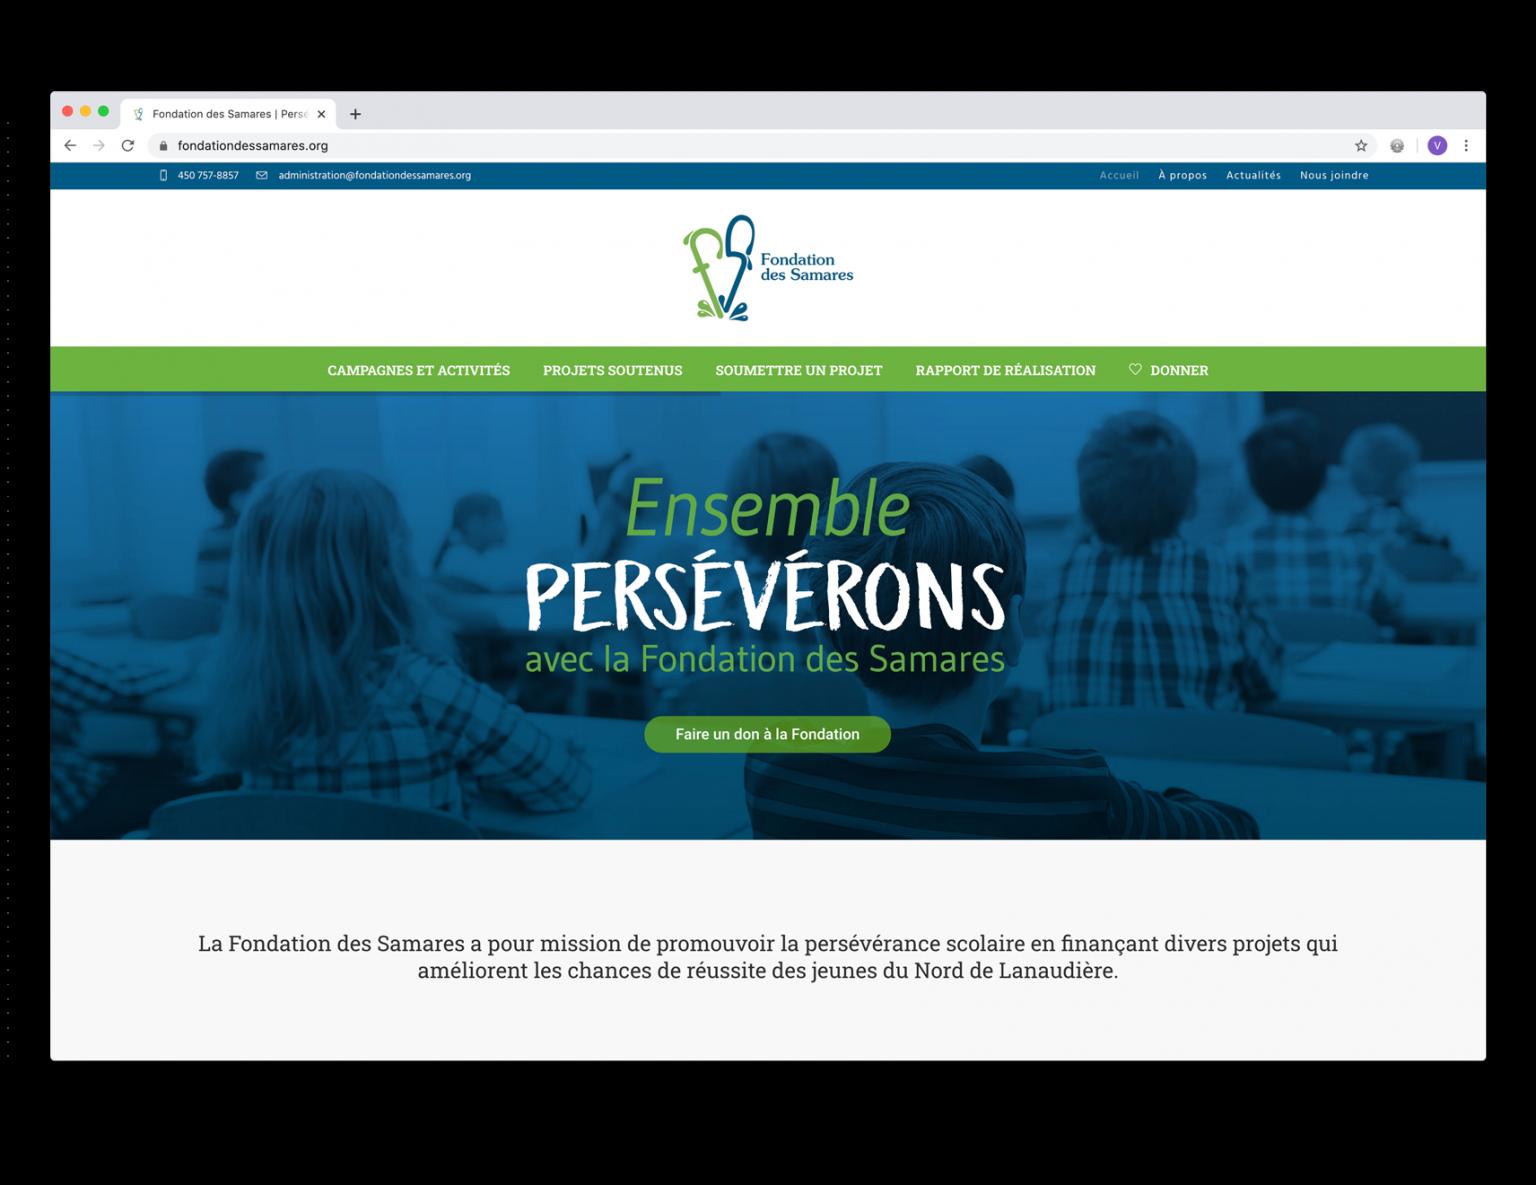 DezWeb_Realisations_FondationDesSamarres